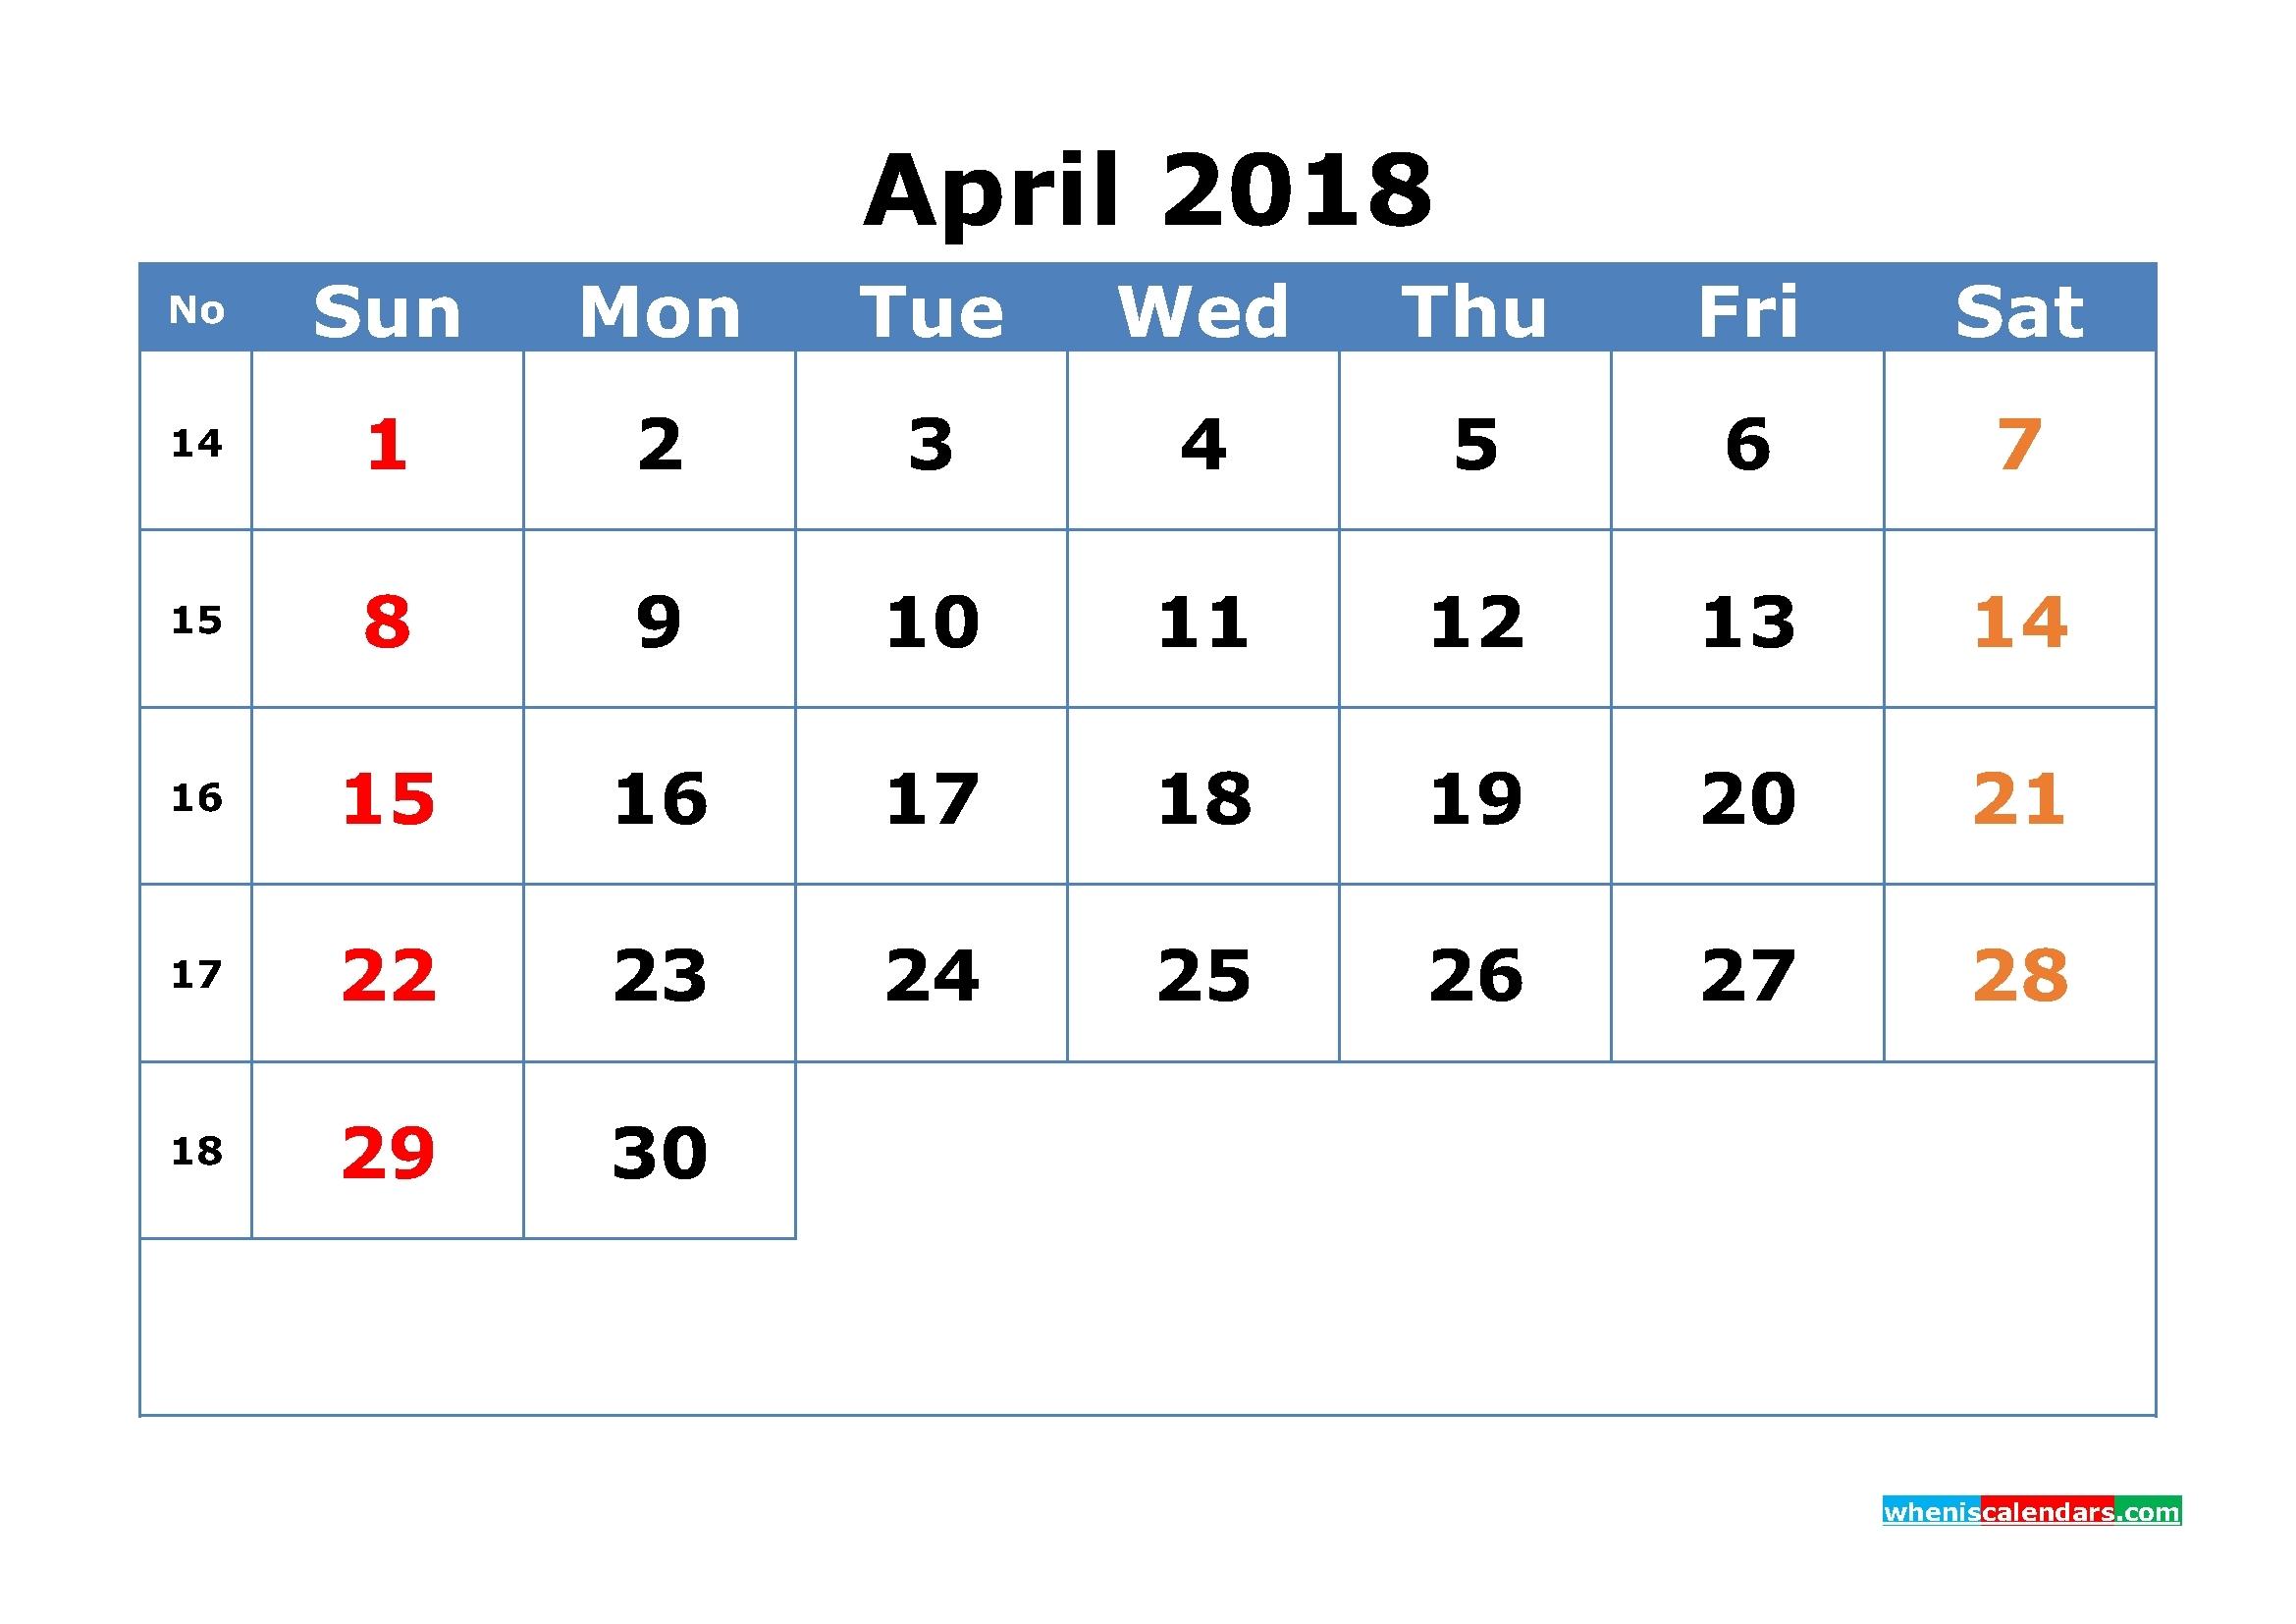 2021 Rut Calender | Calendar Printables Free Blank inside Calendar Zile Lucratoare 2021 Image